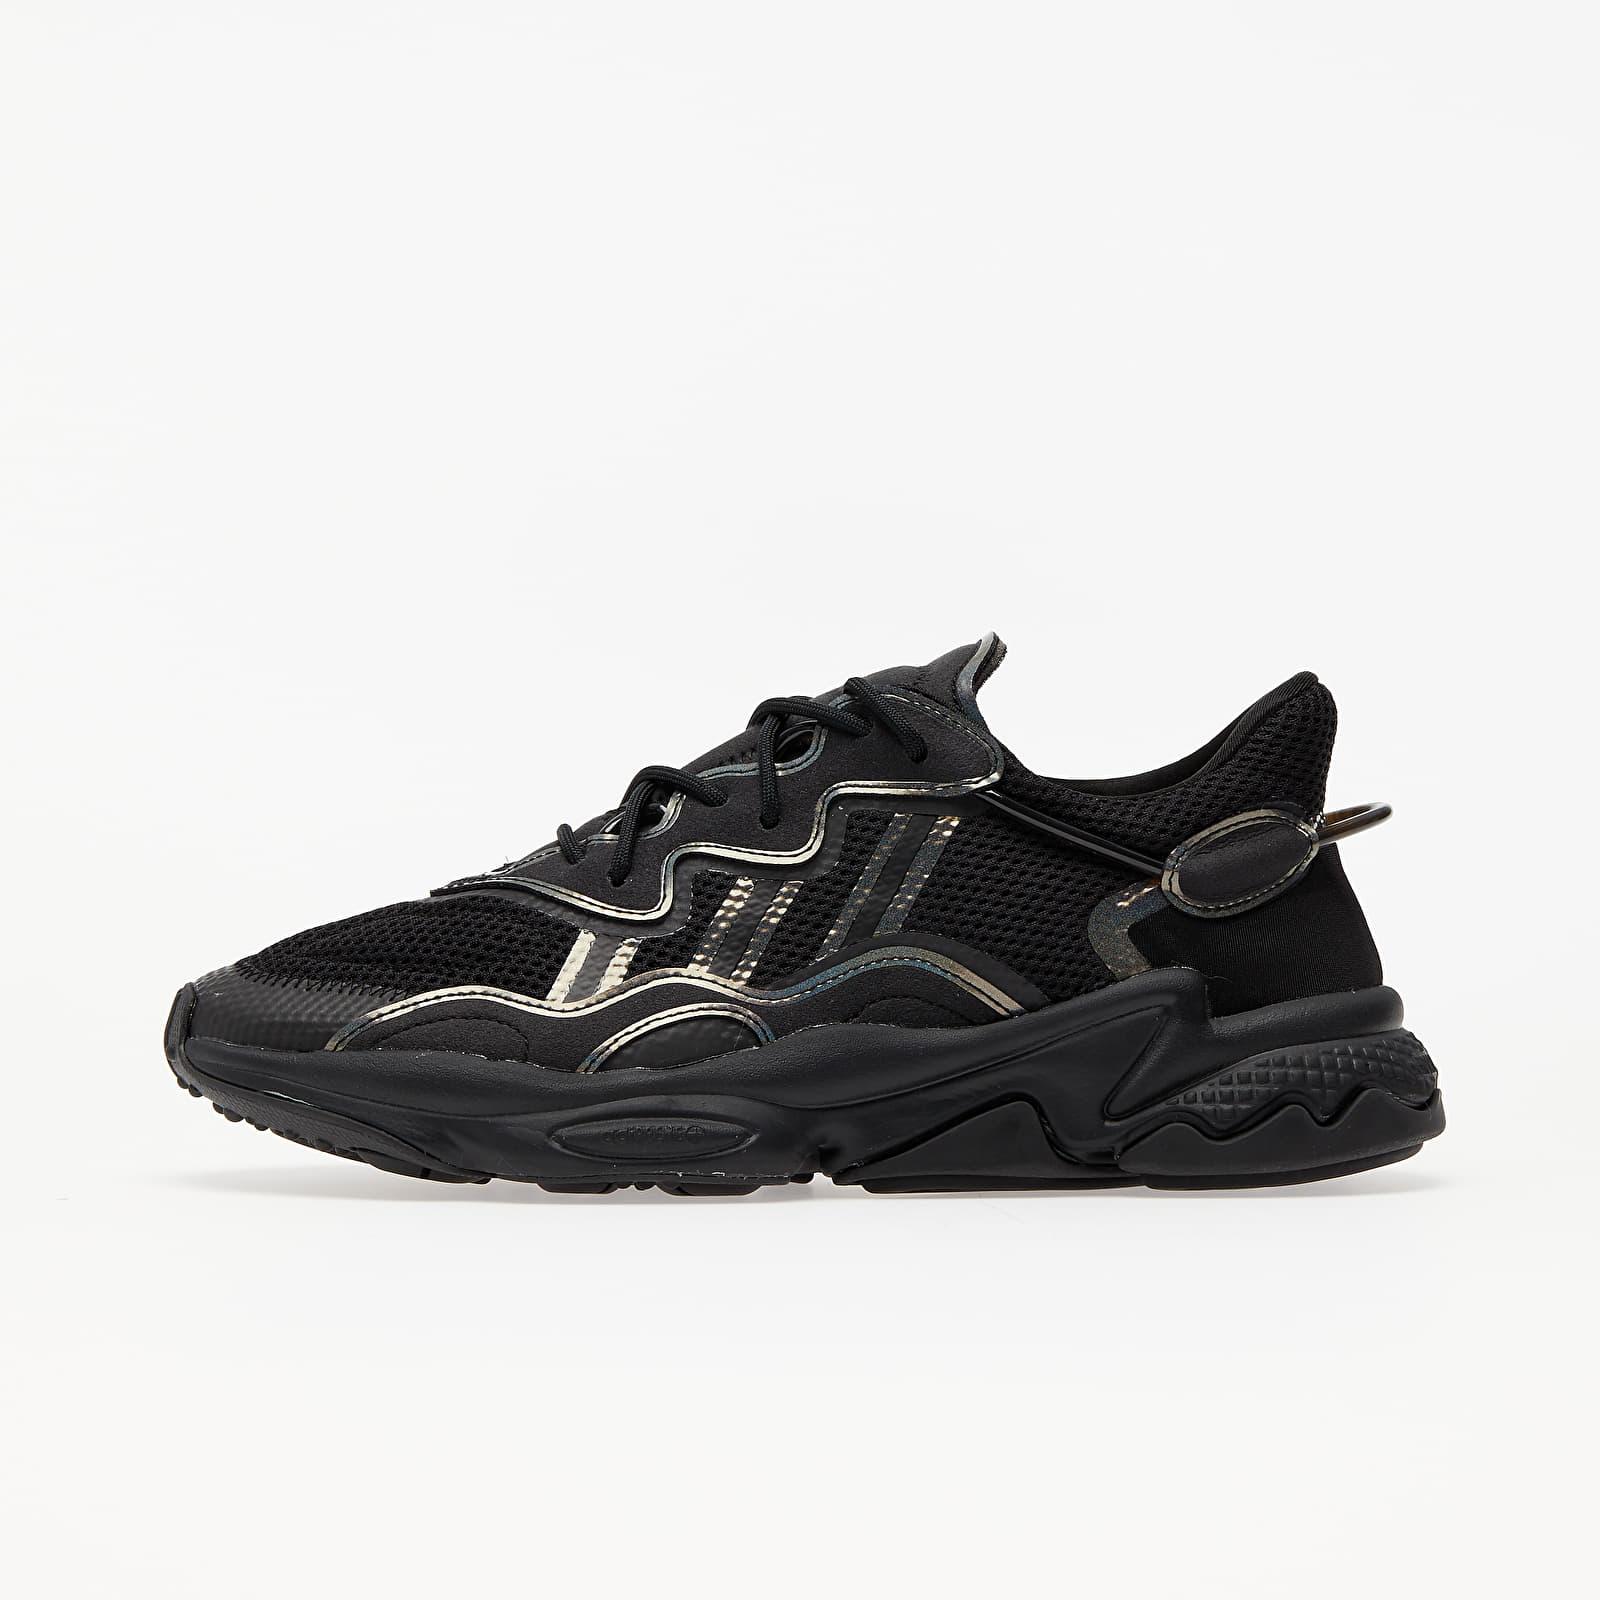 Men's shoes adidas Ozweego Core Black/ Core Black/ Ftw White